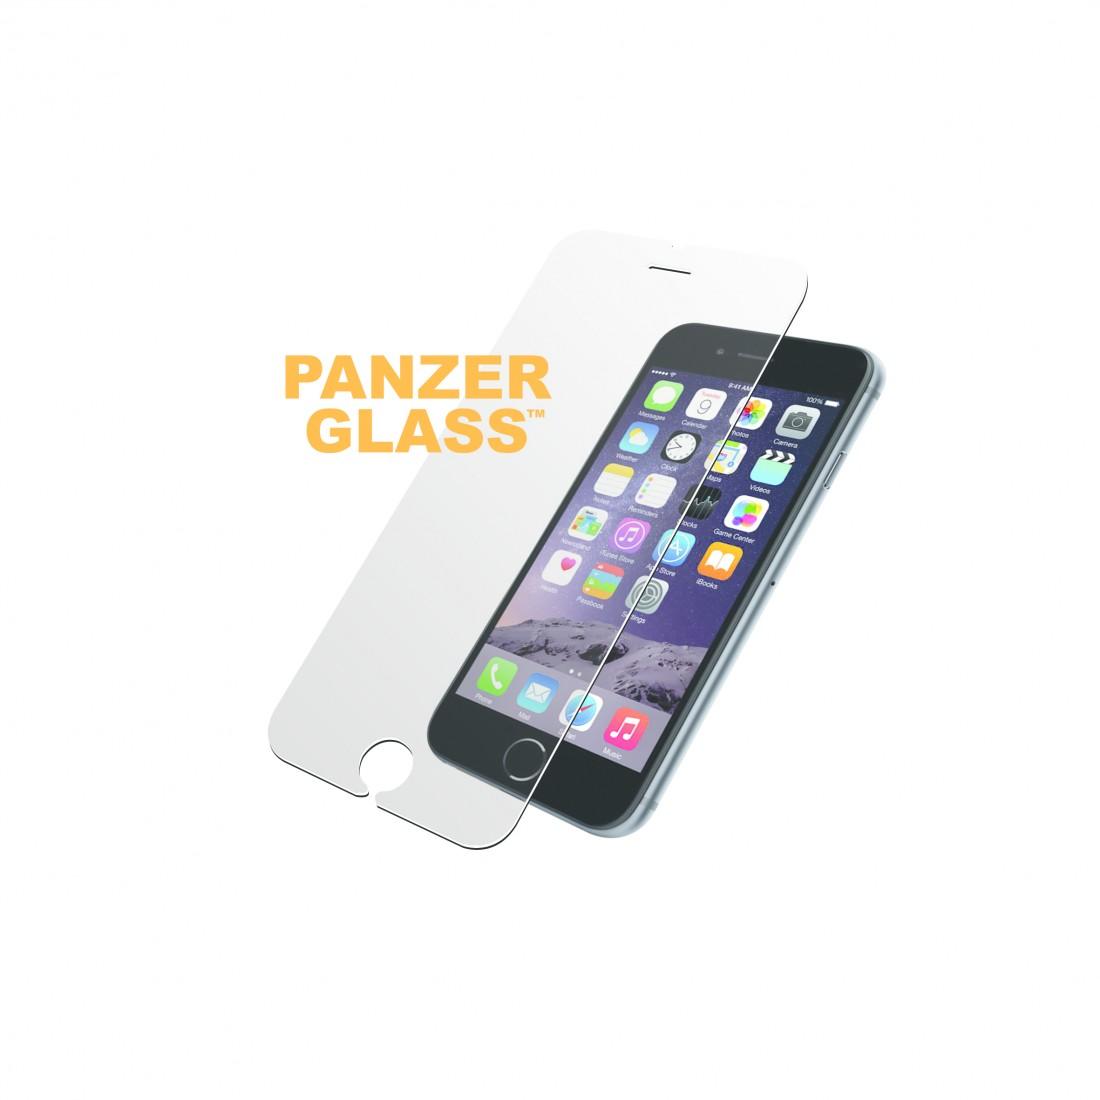 Cristal templado - Panzerglass P166265, Iphone 6/6S Plus